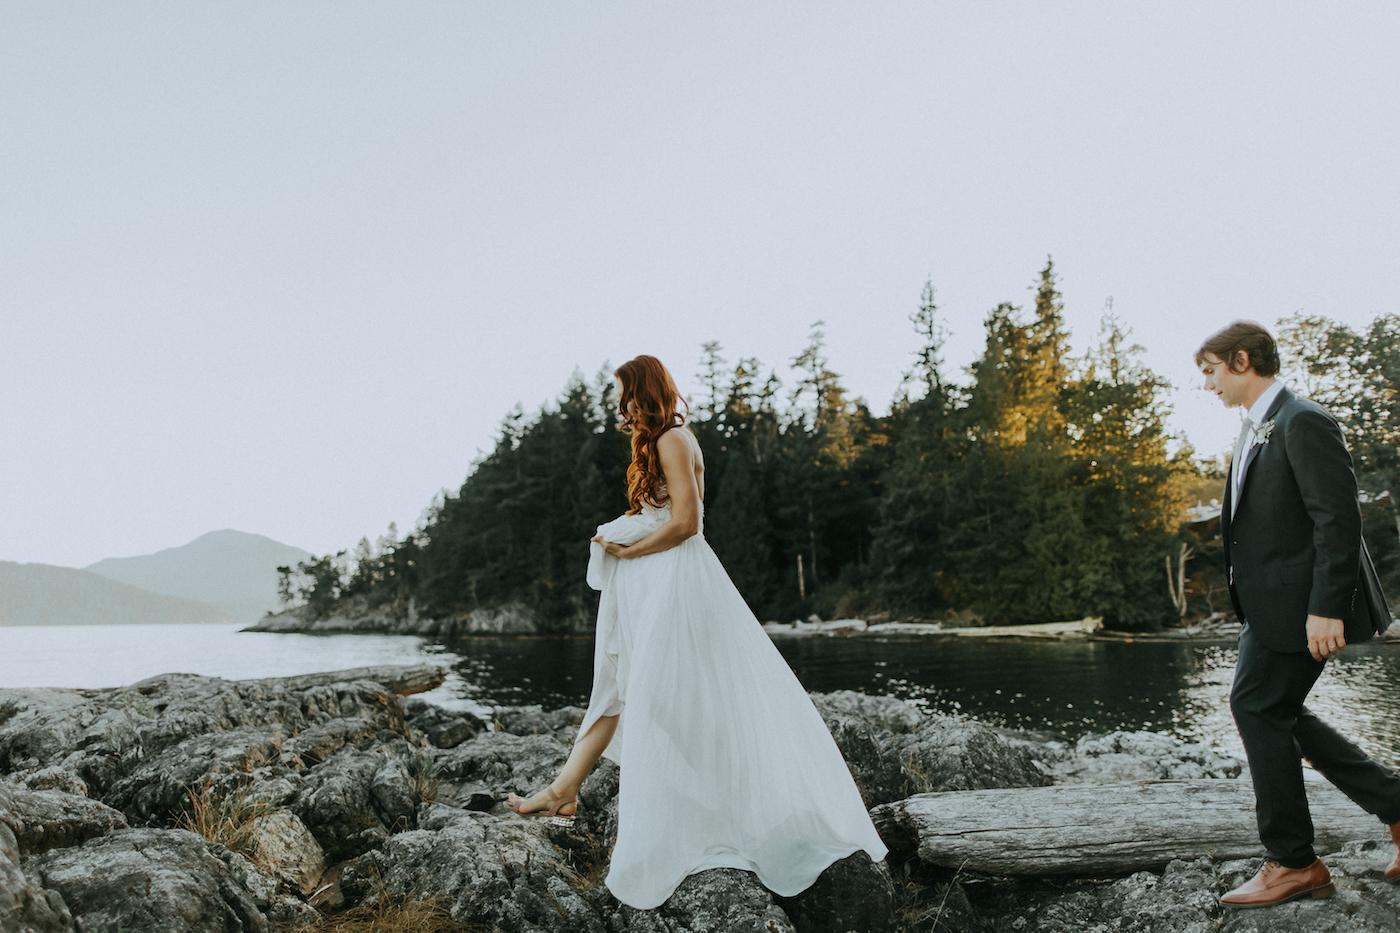 Wedding-Camp-Fircom-Gambier-Island-31.jpg